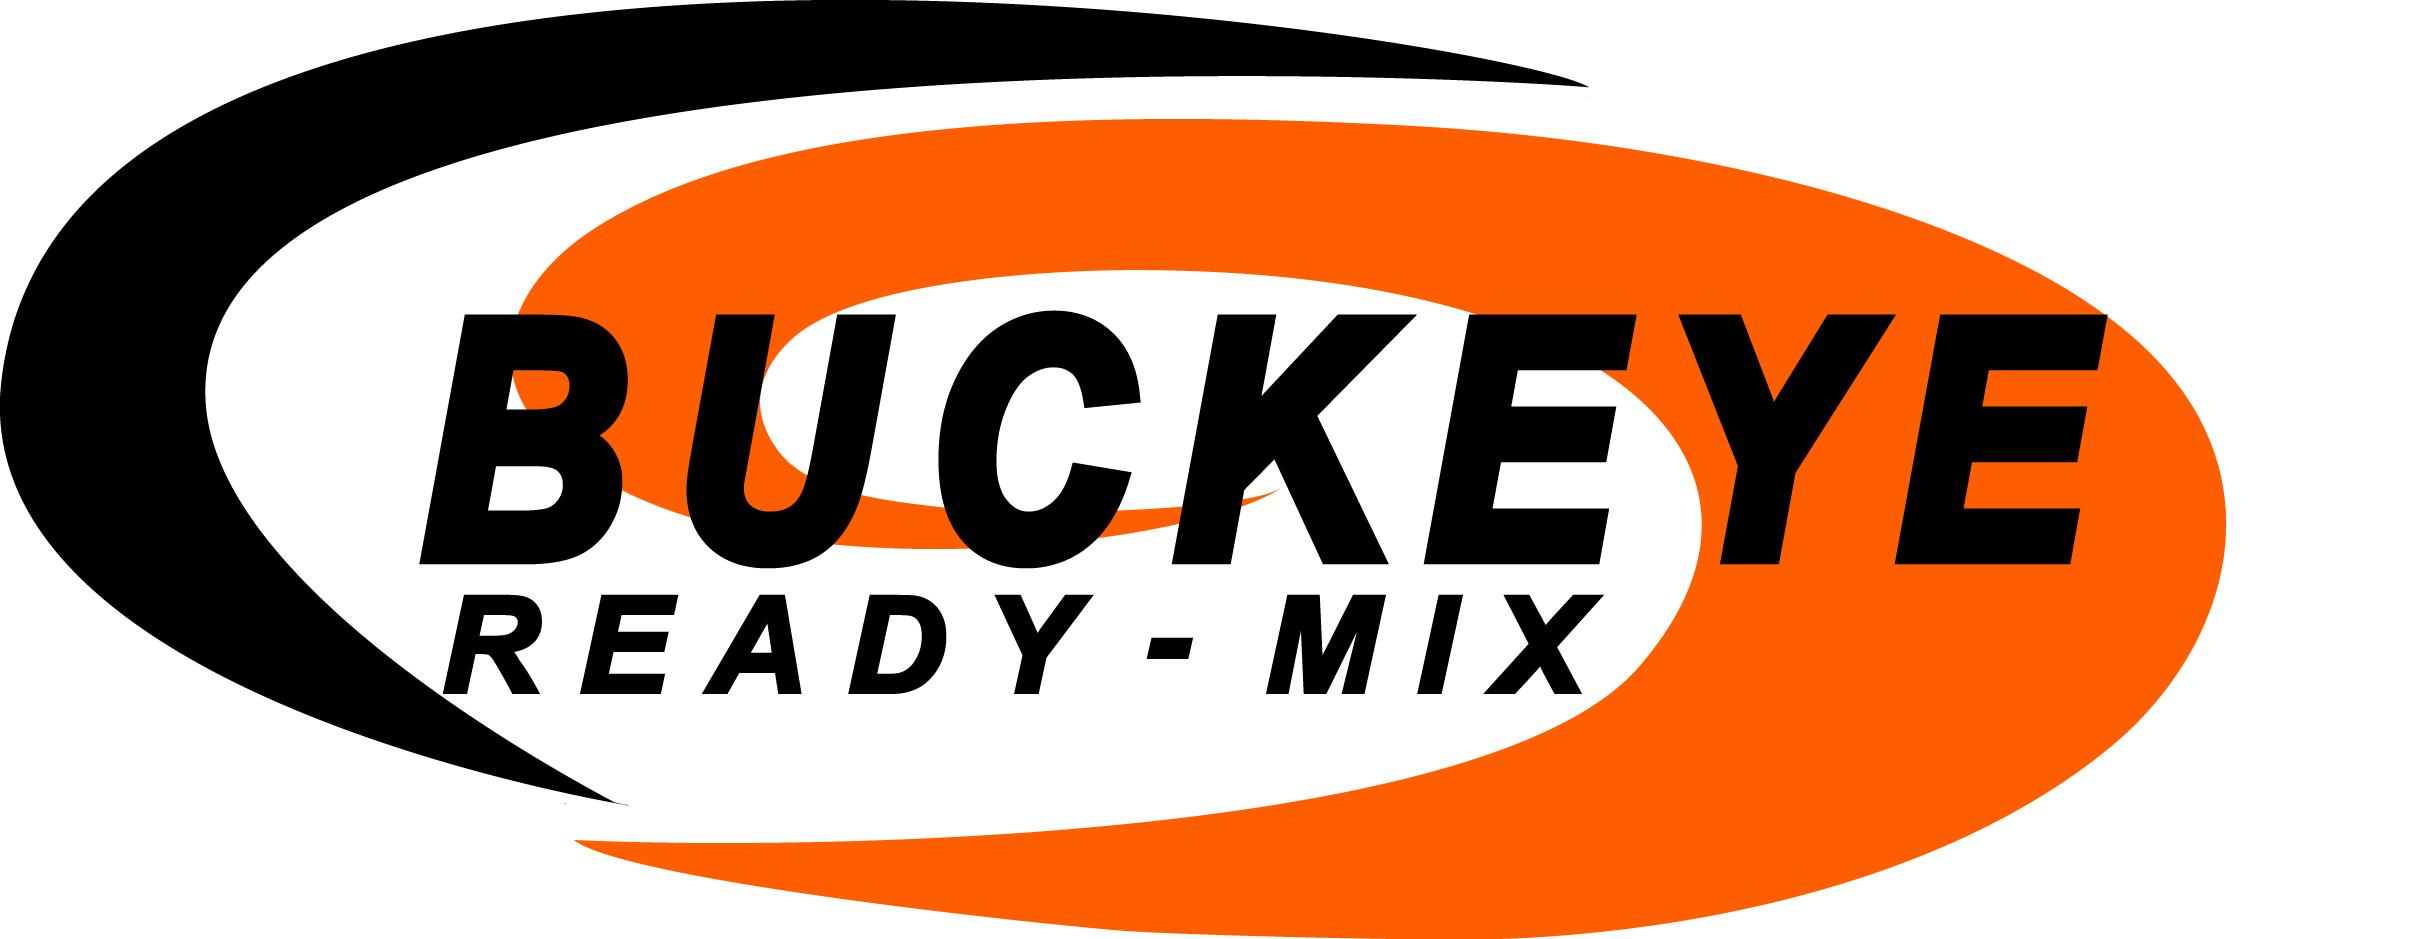 Buckeye-Ready-Mix(1).jpg